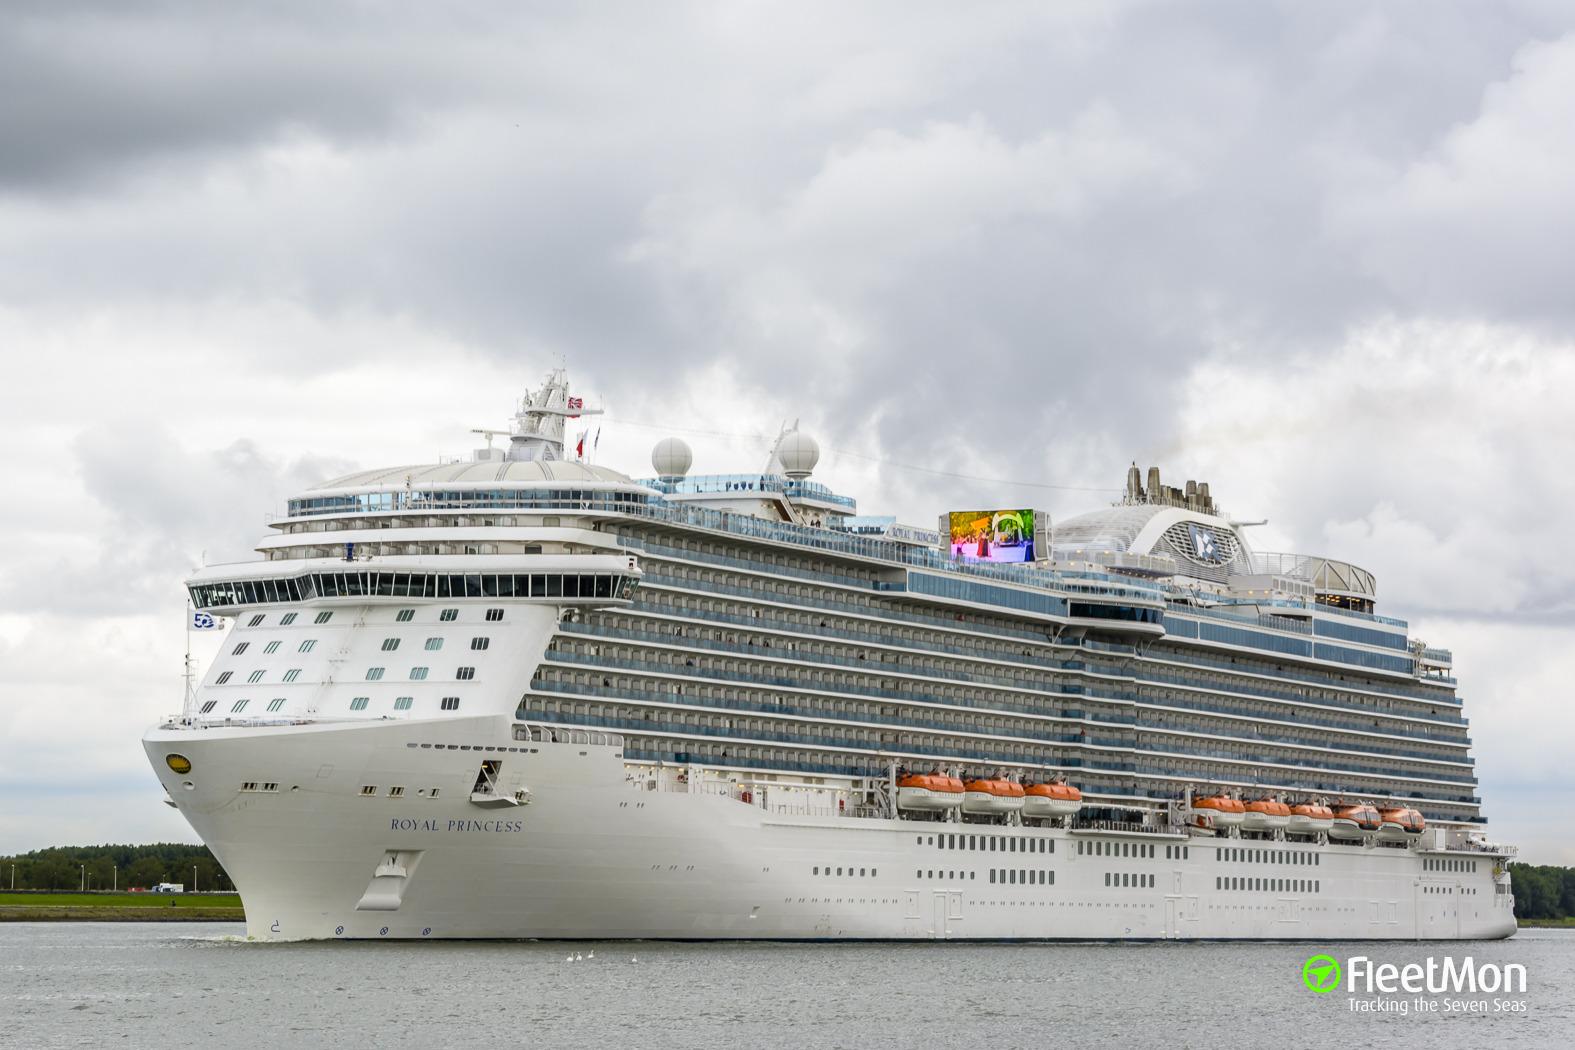 Cruise liner Royal Princess disabled after blackout in Med